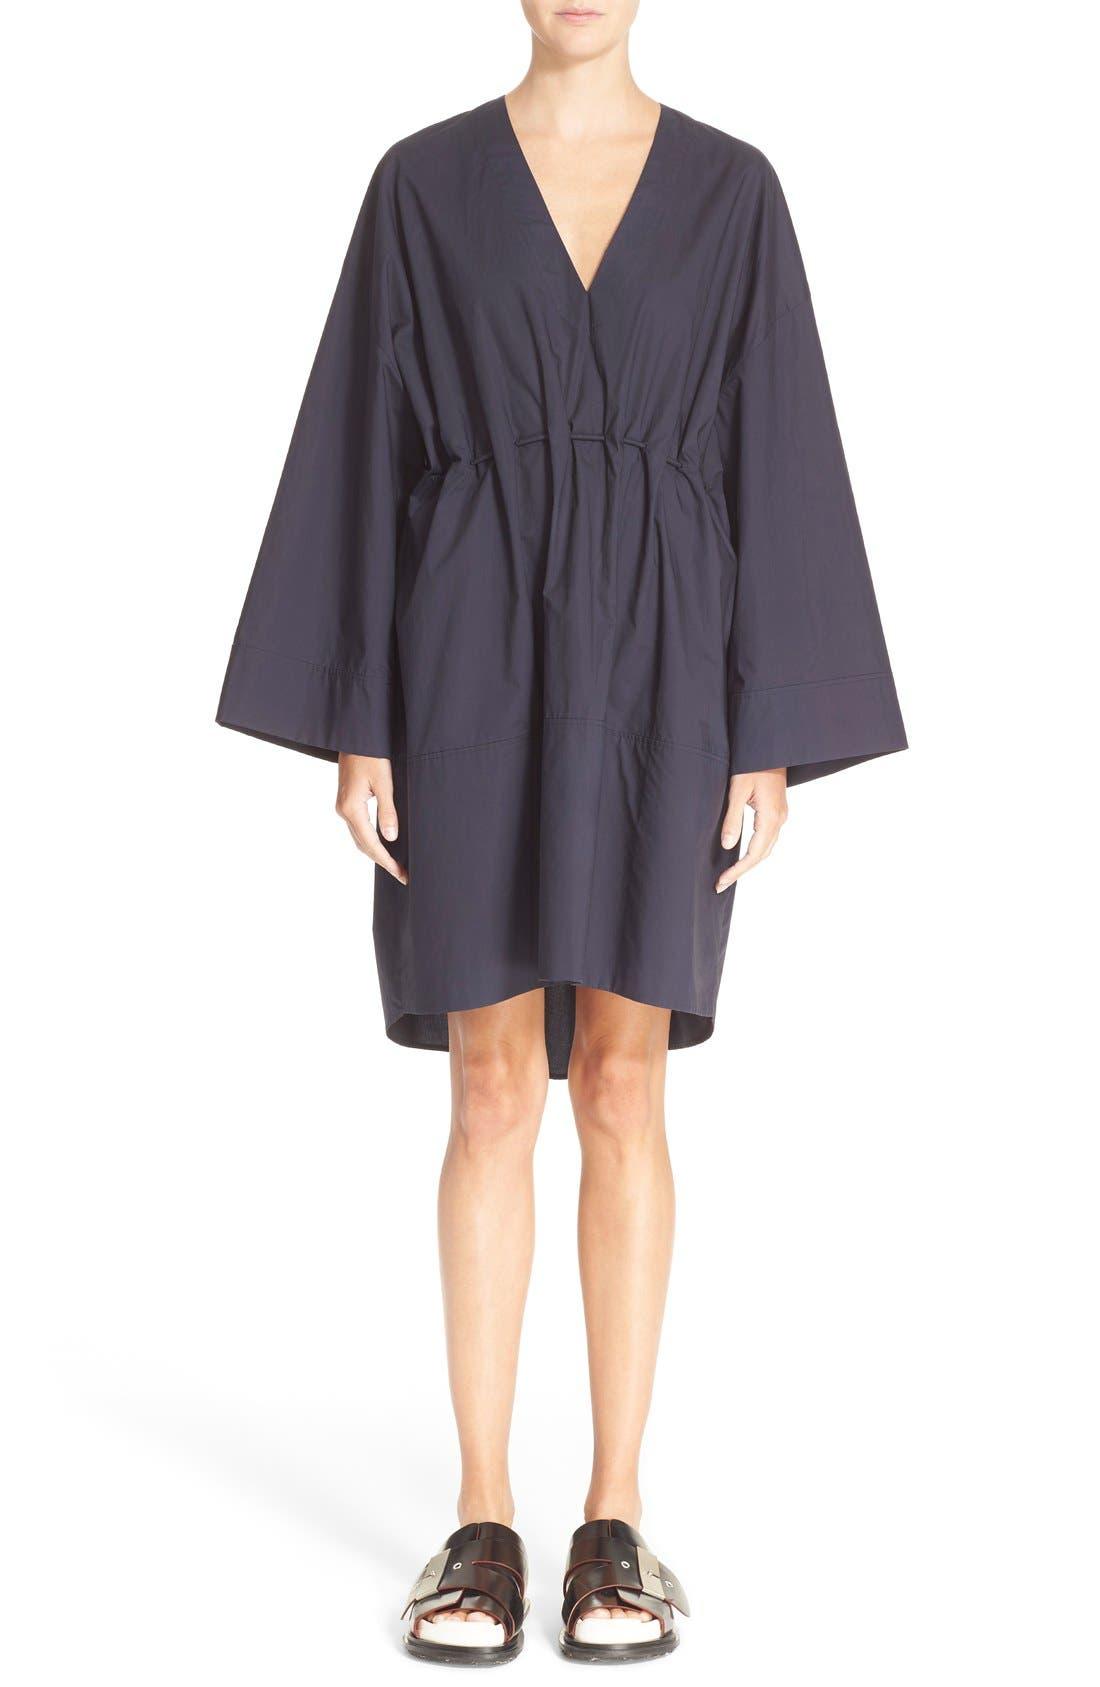 Alternate Image 1 Selected - ACNE Studios 'Calida' Cotton Drawstring Dress